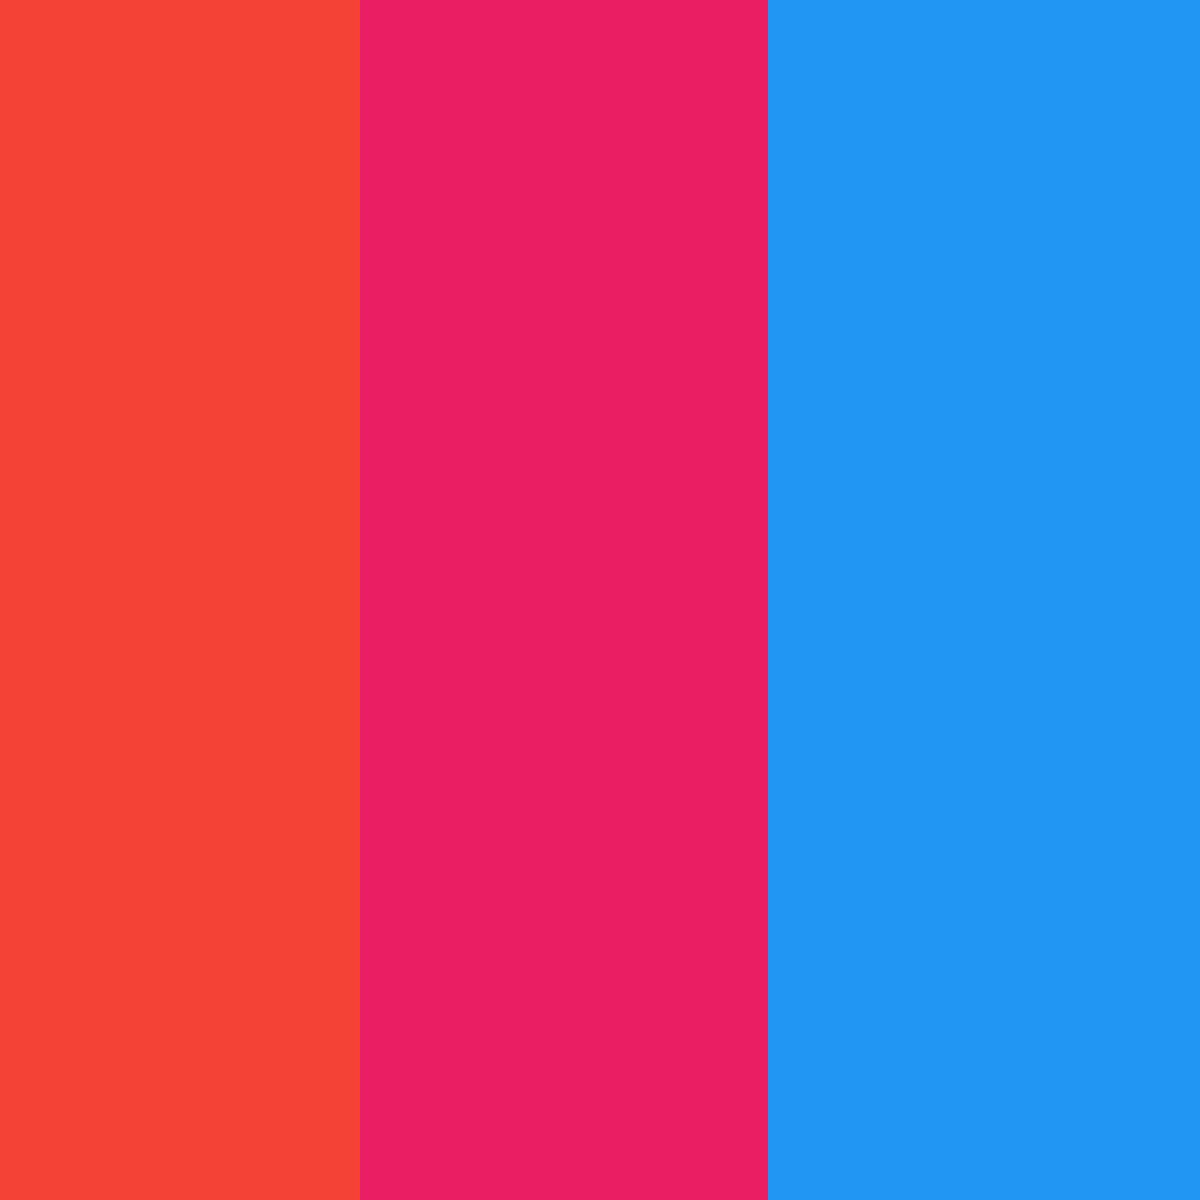 orange pink blue by Pinkunicorn